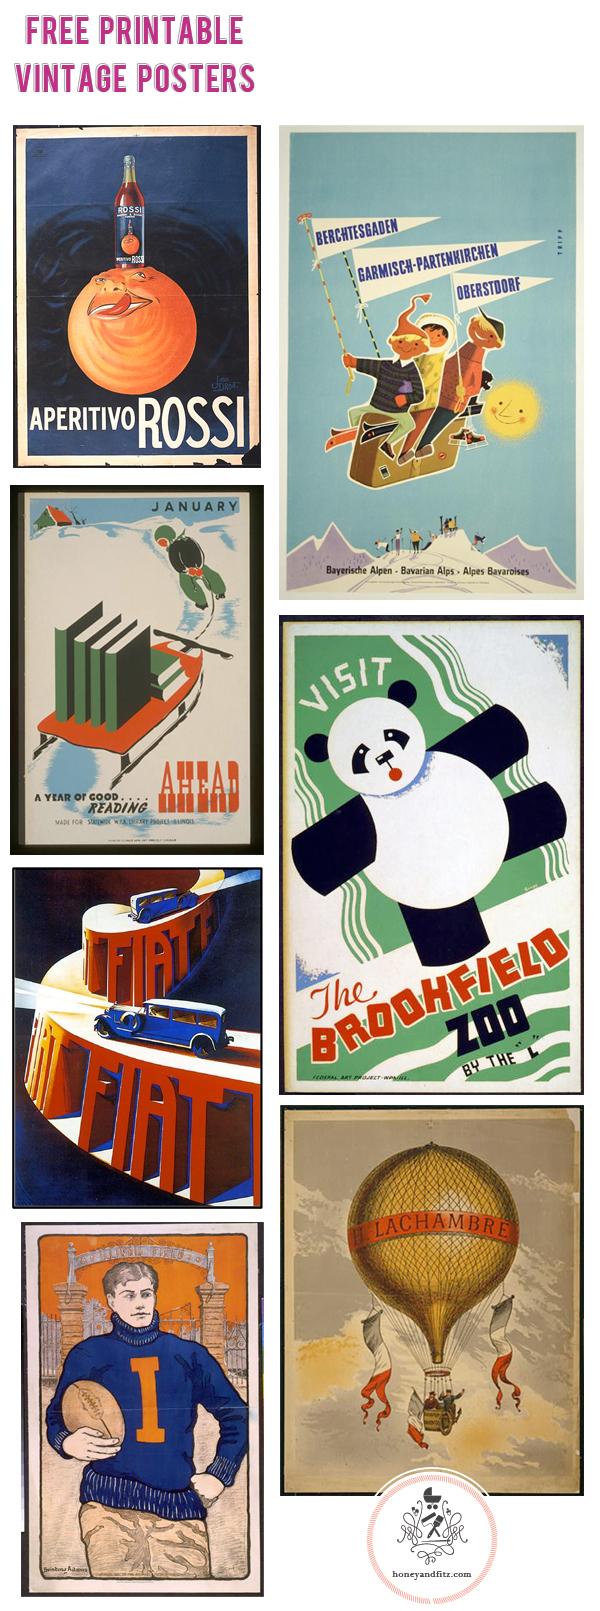 Free Printable Vintage Posters - Free Printable Sports Posters